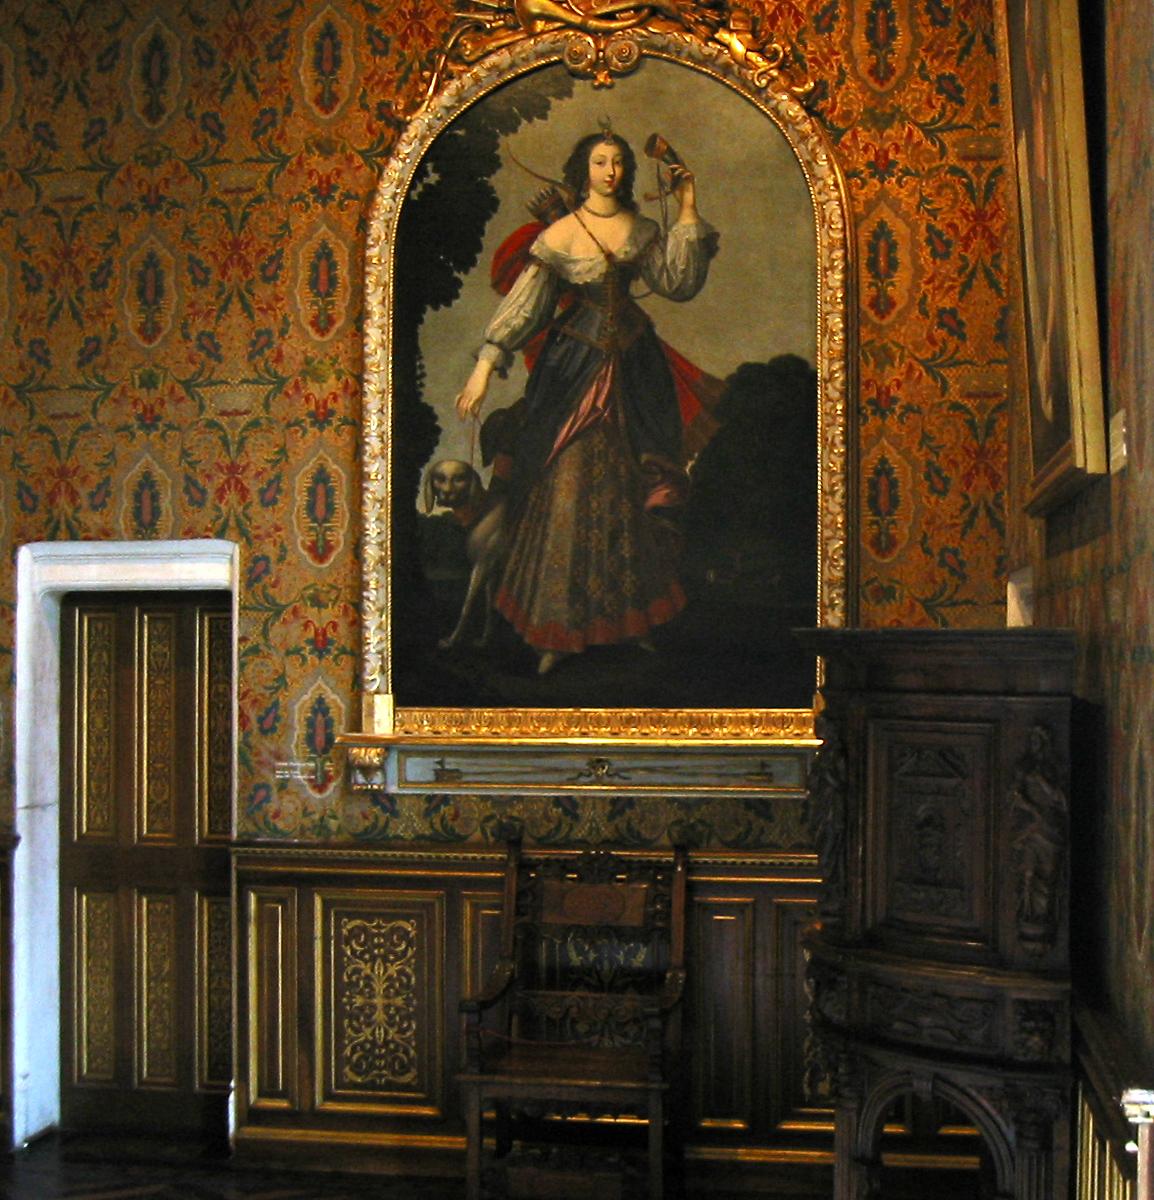 Diane de poitiers wikipedia the free encyclopedia - Salon de the poitiers ...